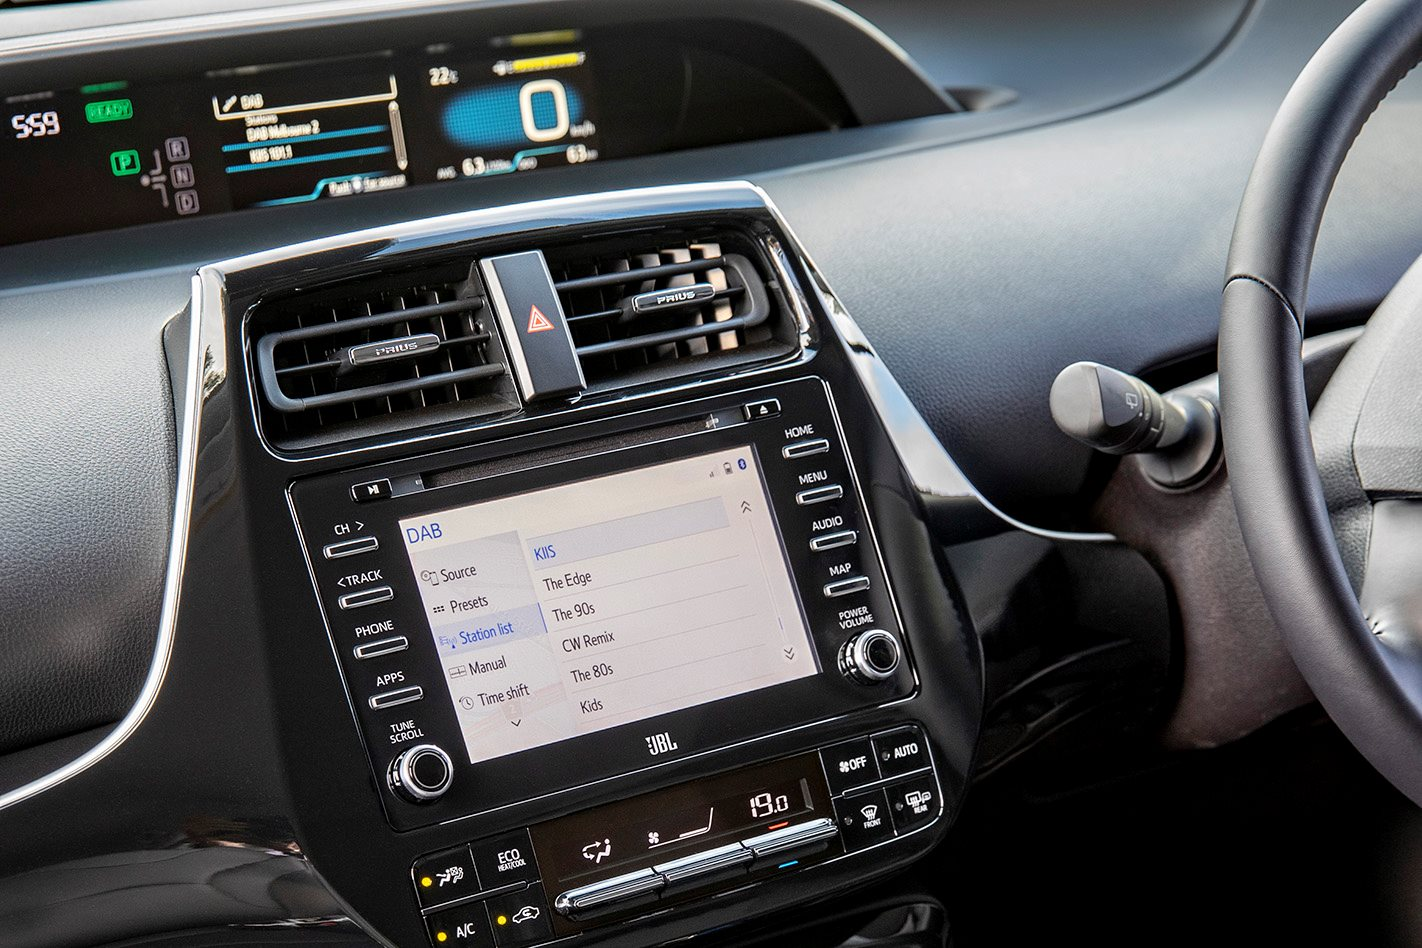 2019 Toyota Prius quick review